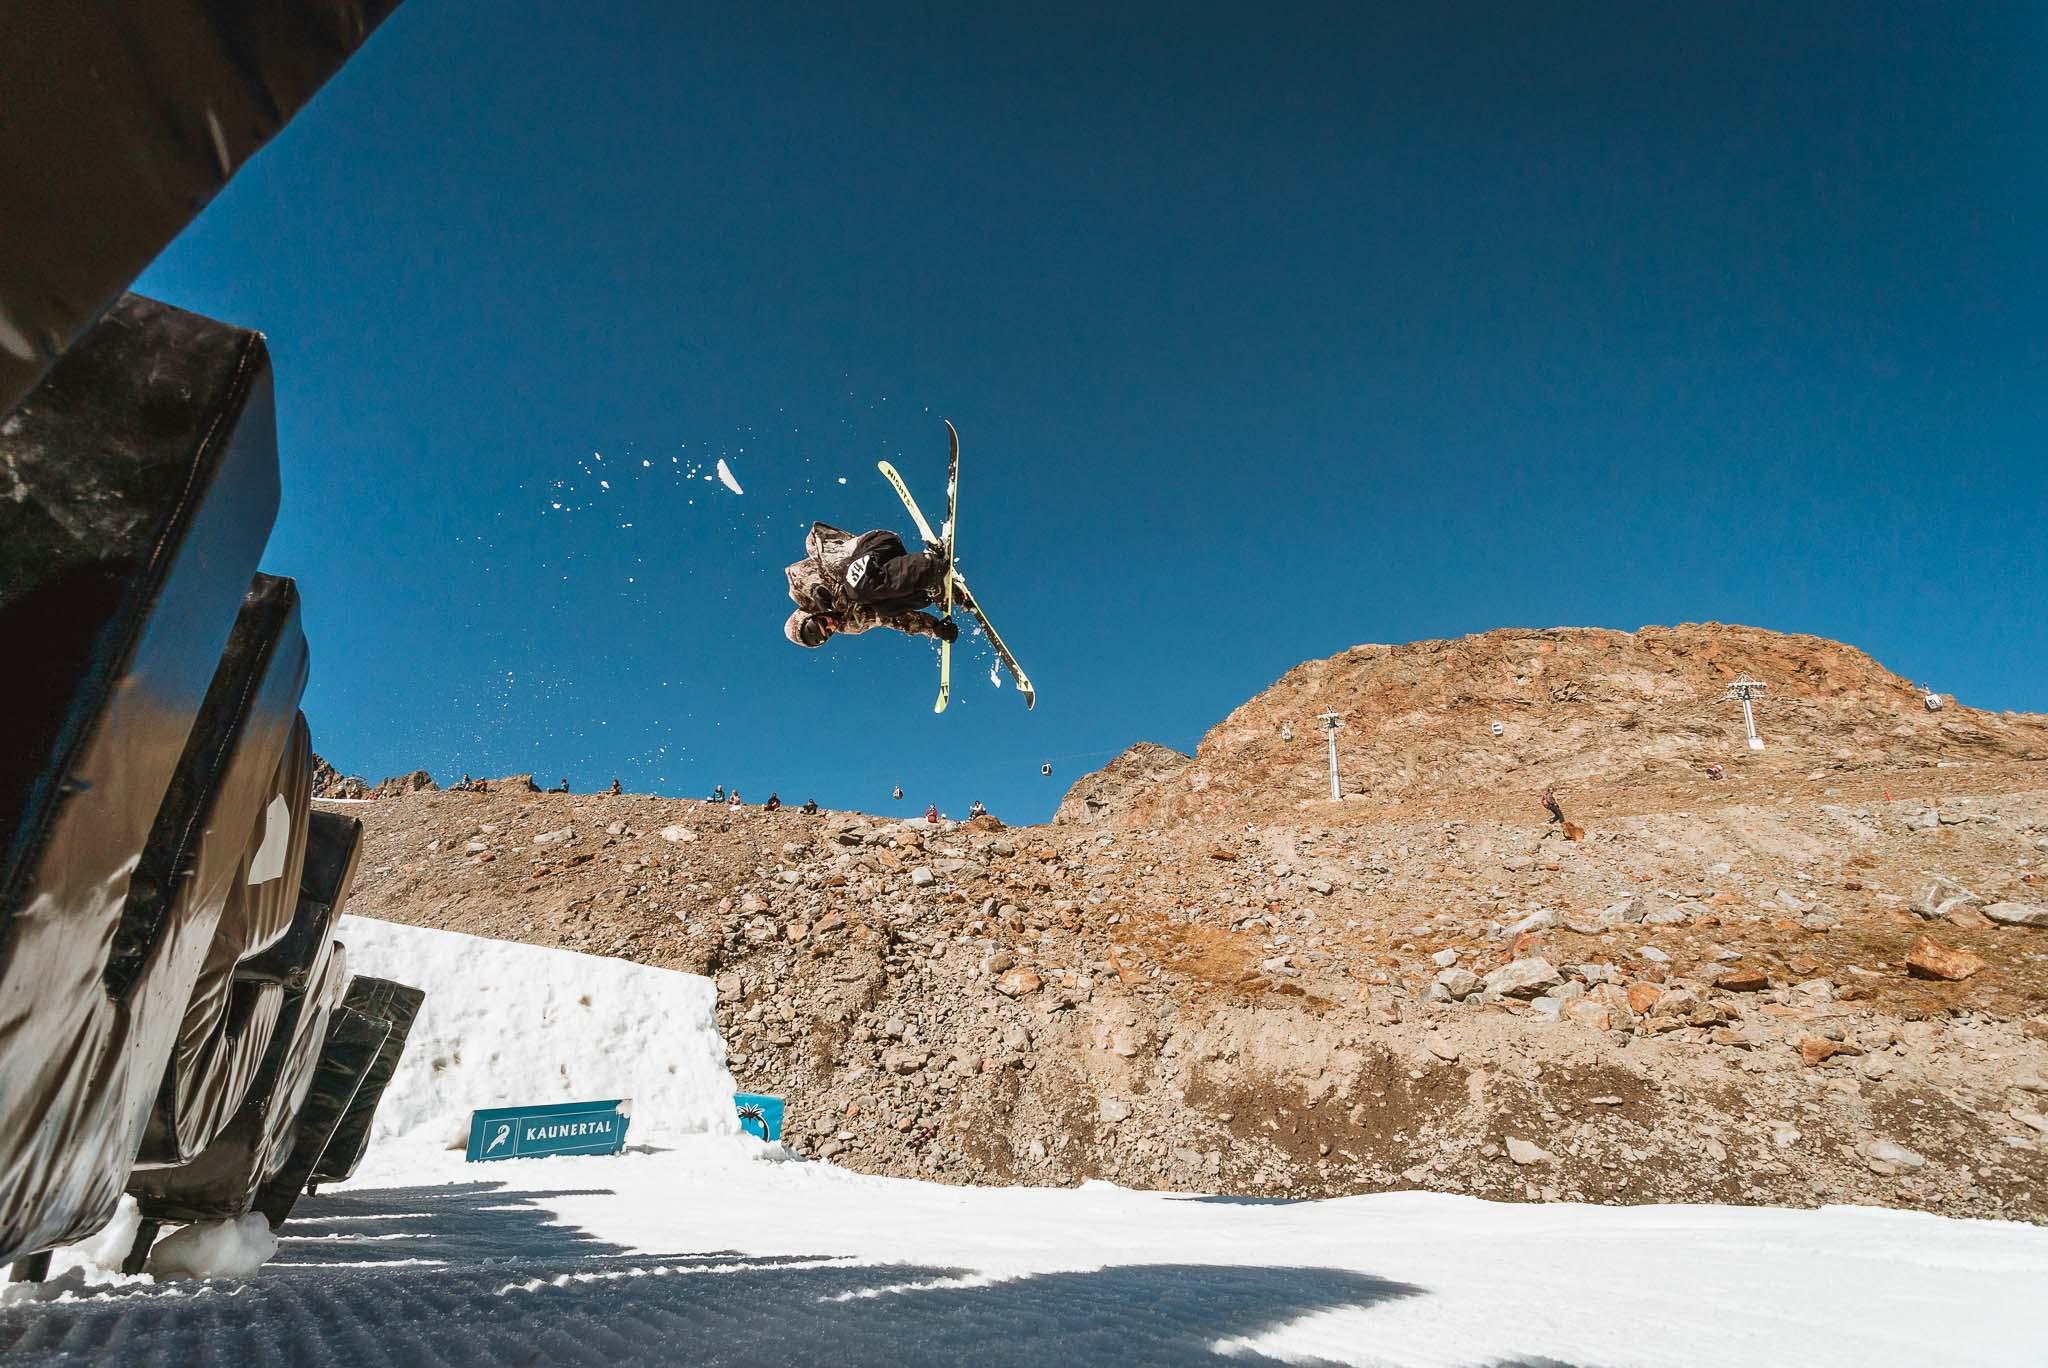 Rider: Luca Pichler